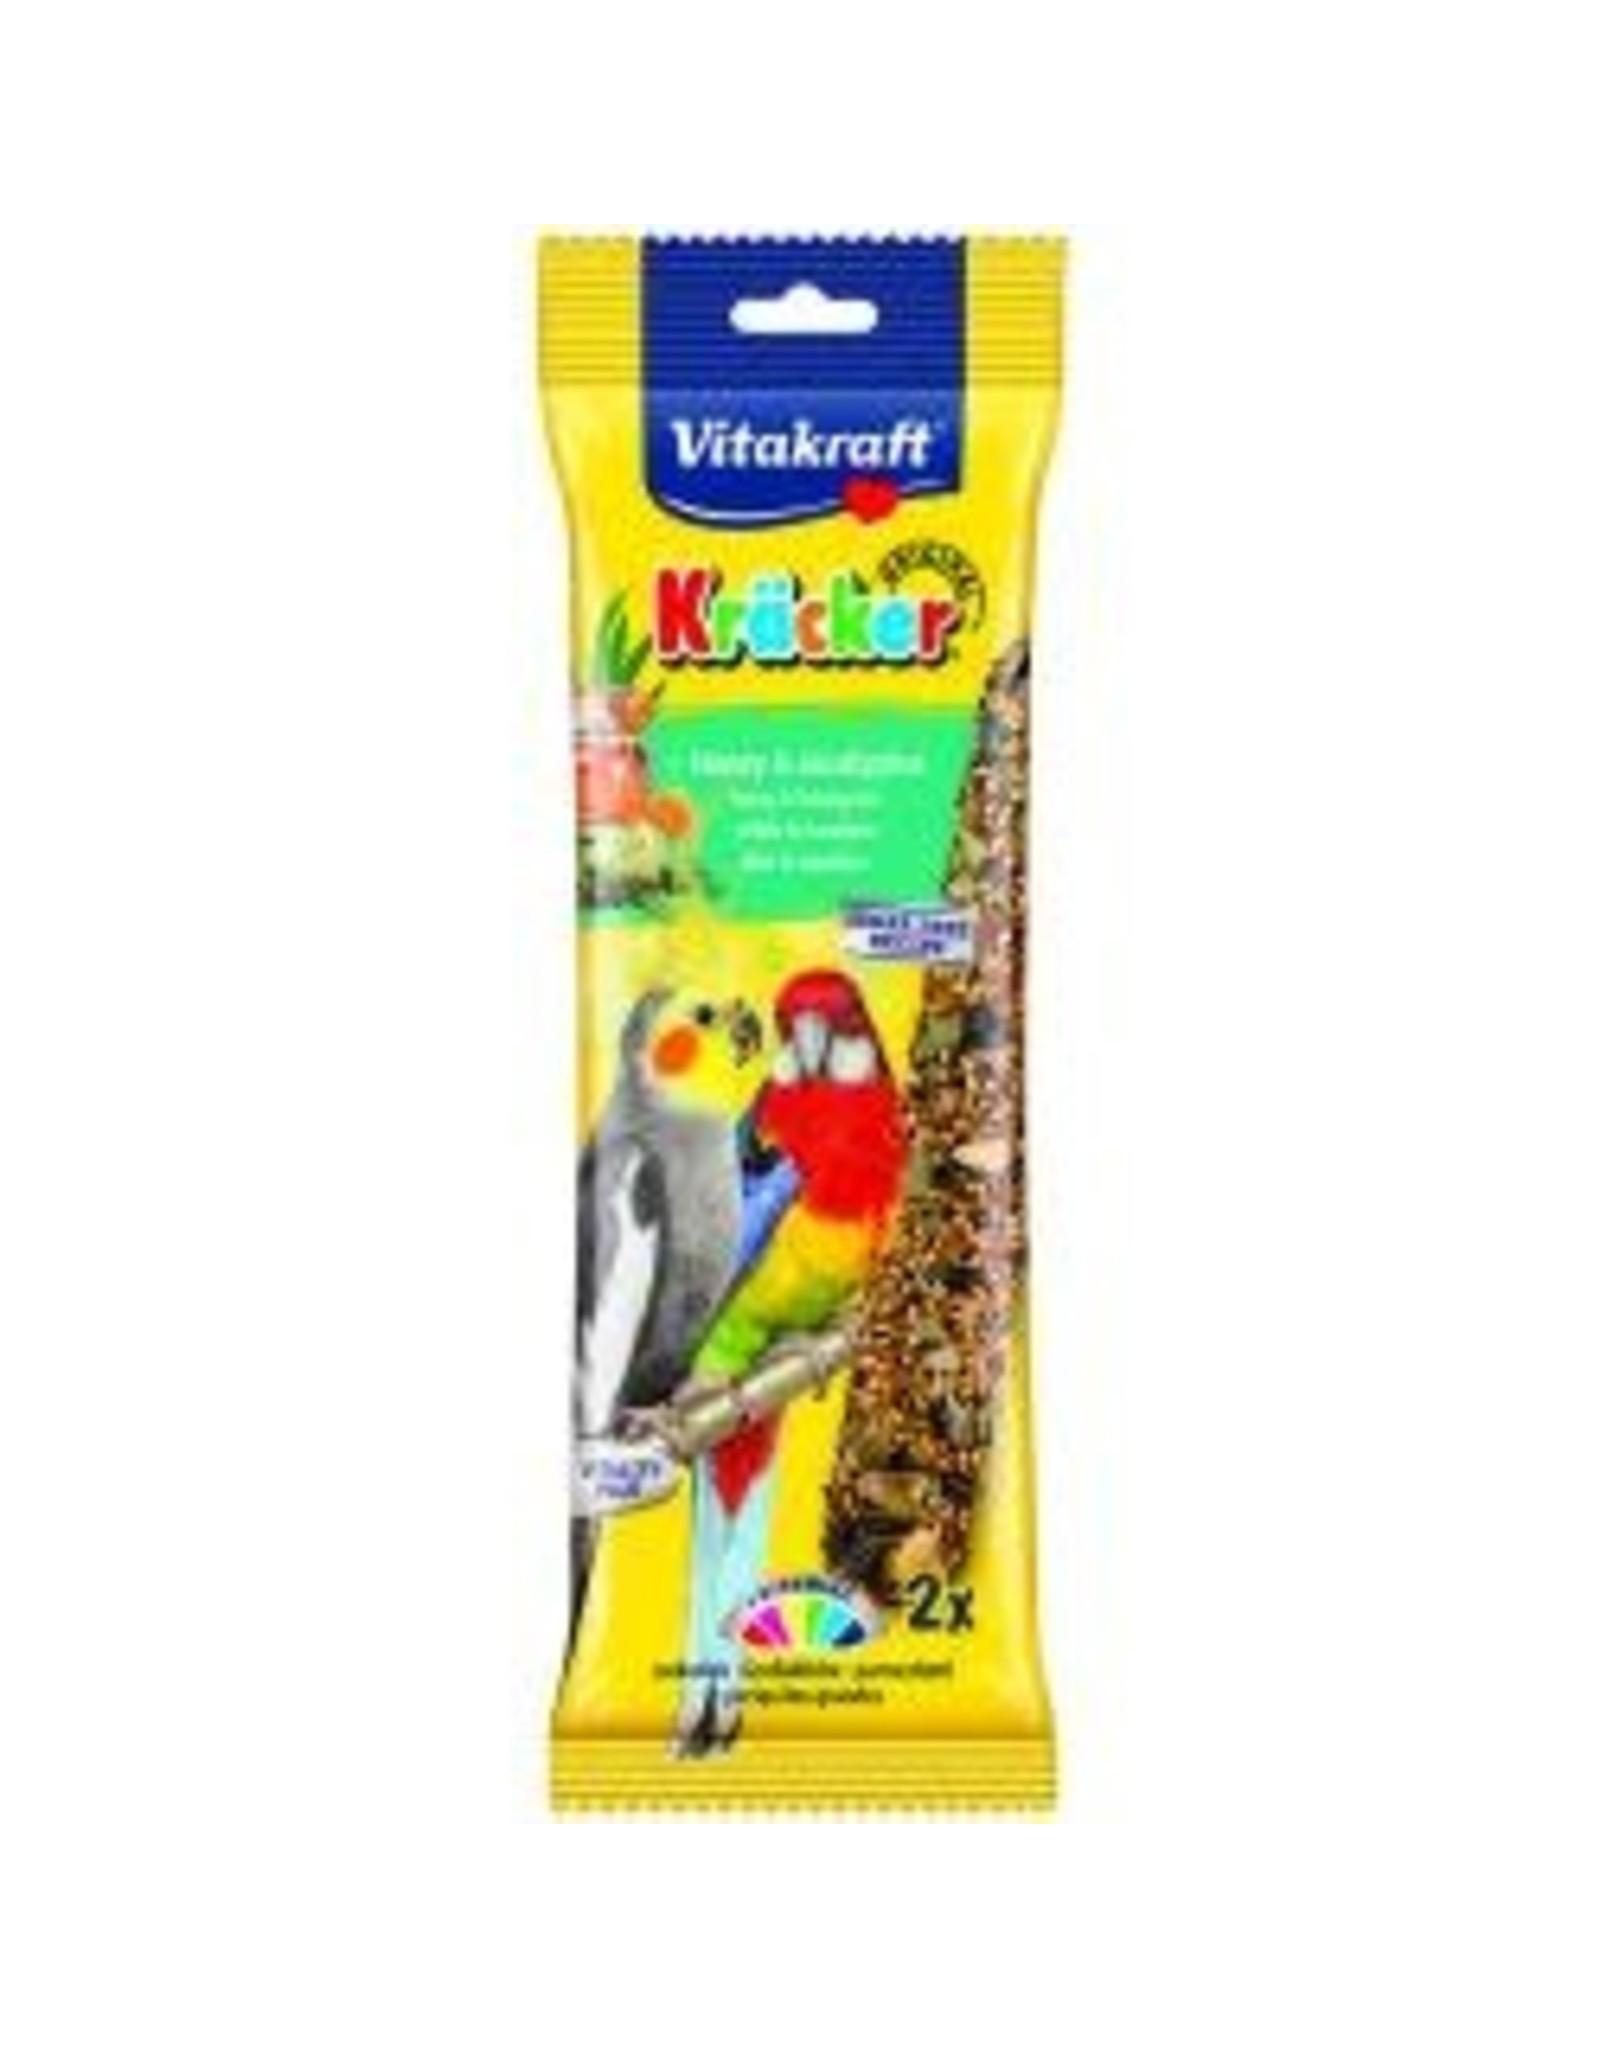 Vitakraft Vitakraft Cockatiel Stick Honey & Eucalyptus Stick 2 Pack